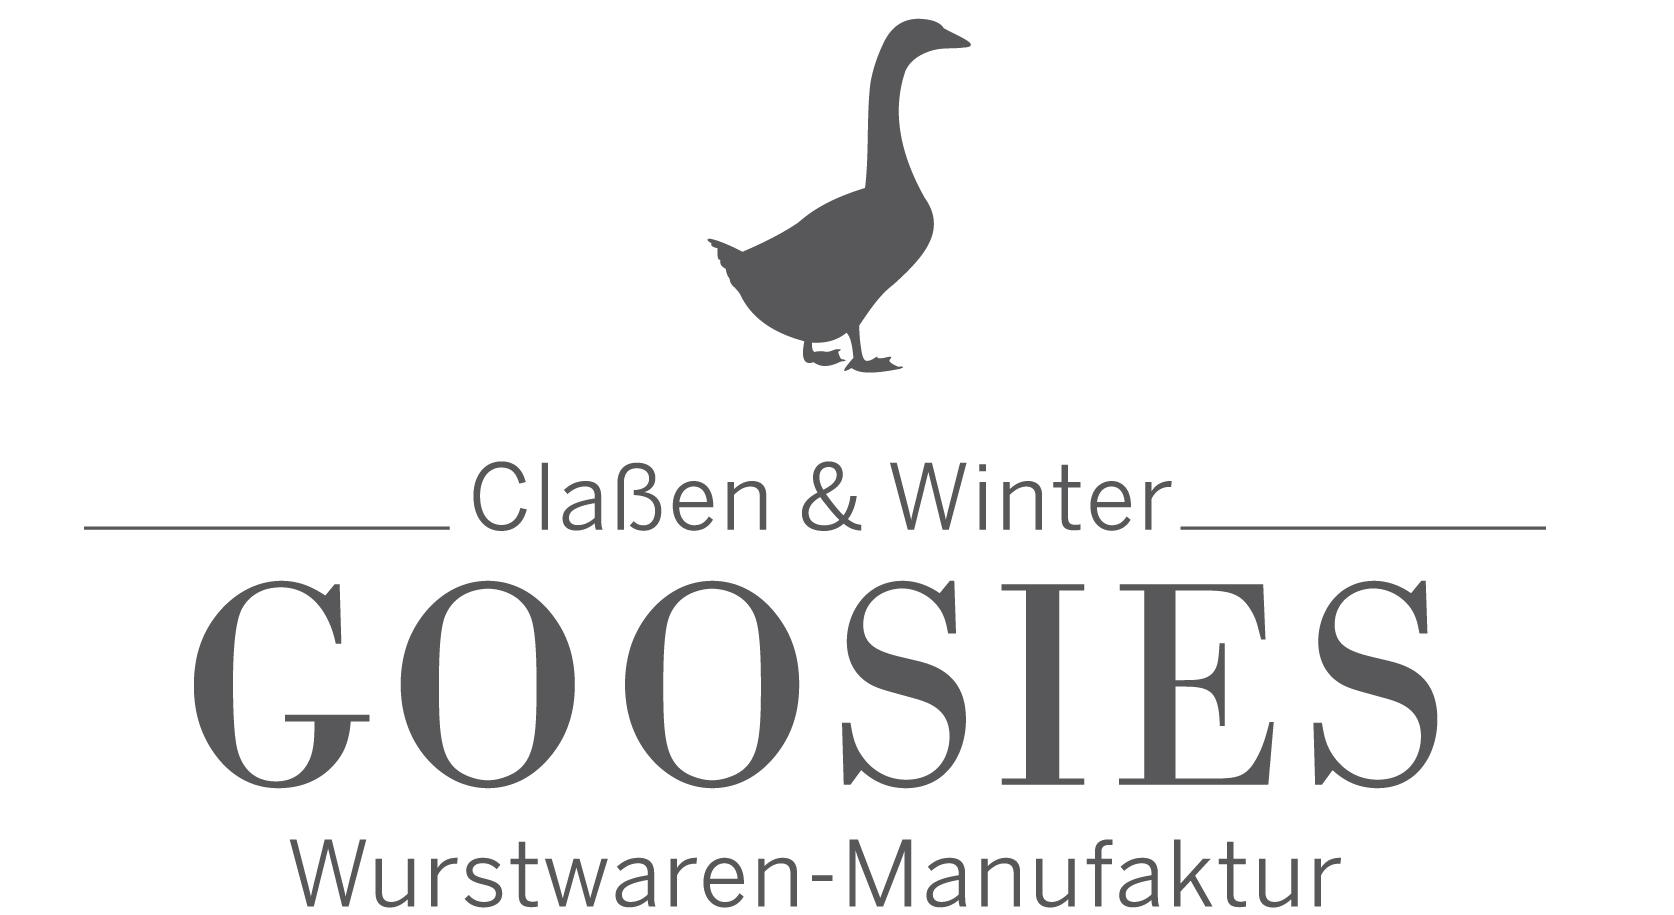 Classen & Winter GbR